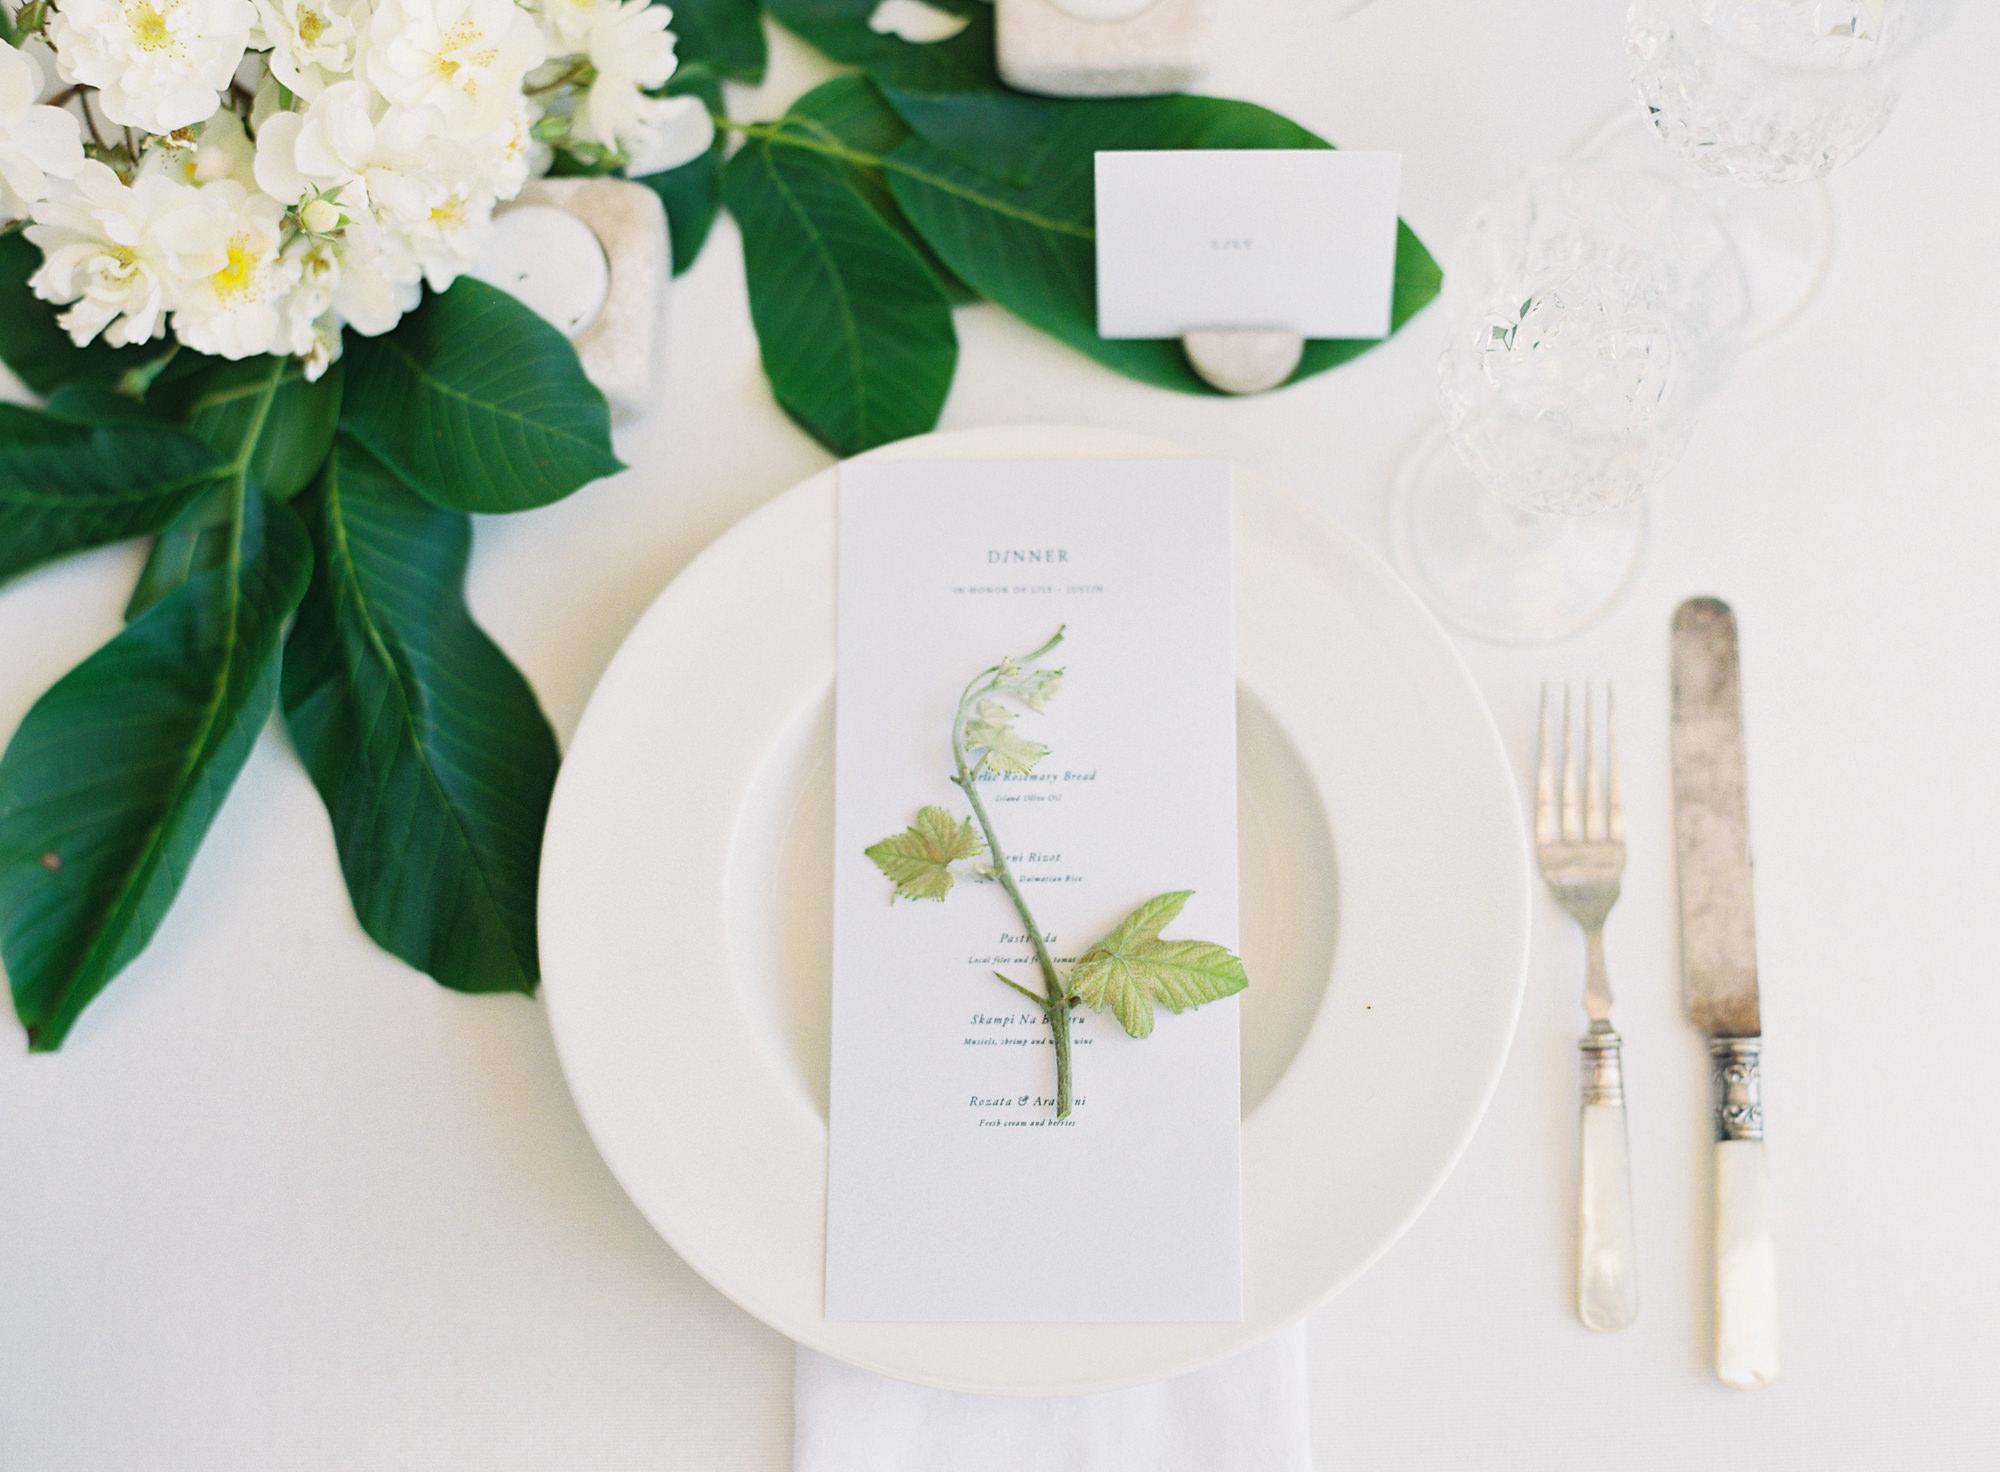 worlds-best-wedding-photos-dinner-menu-ivory-laurel-accents-jen-huang-los-angeles-wedding-photographer